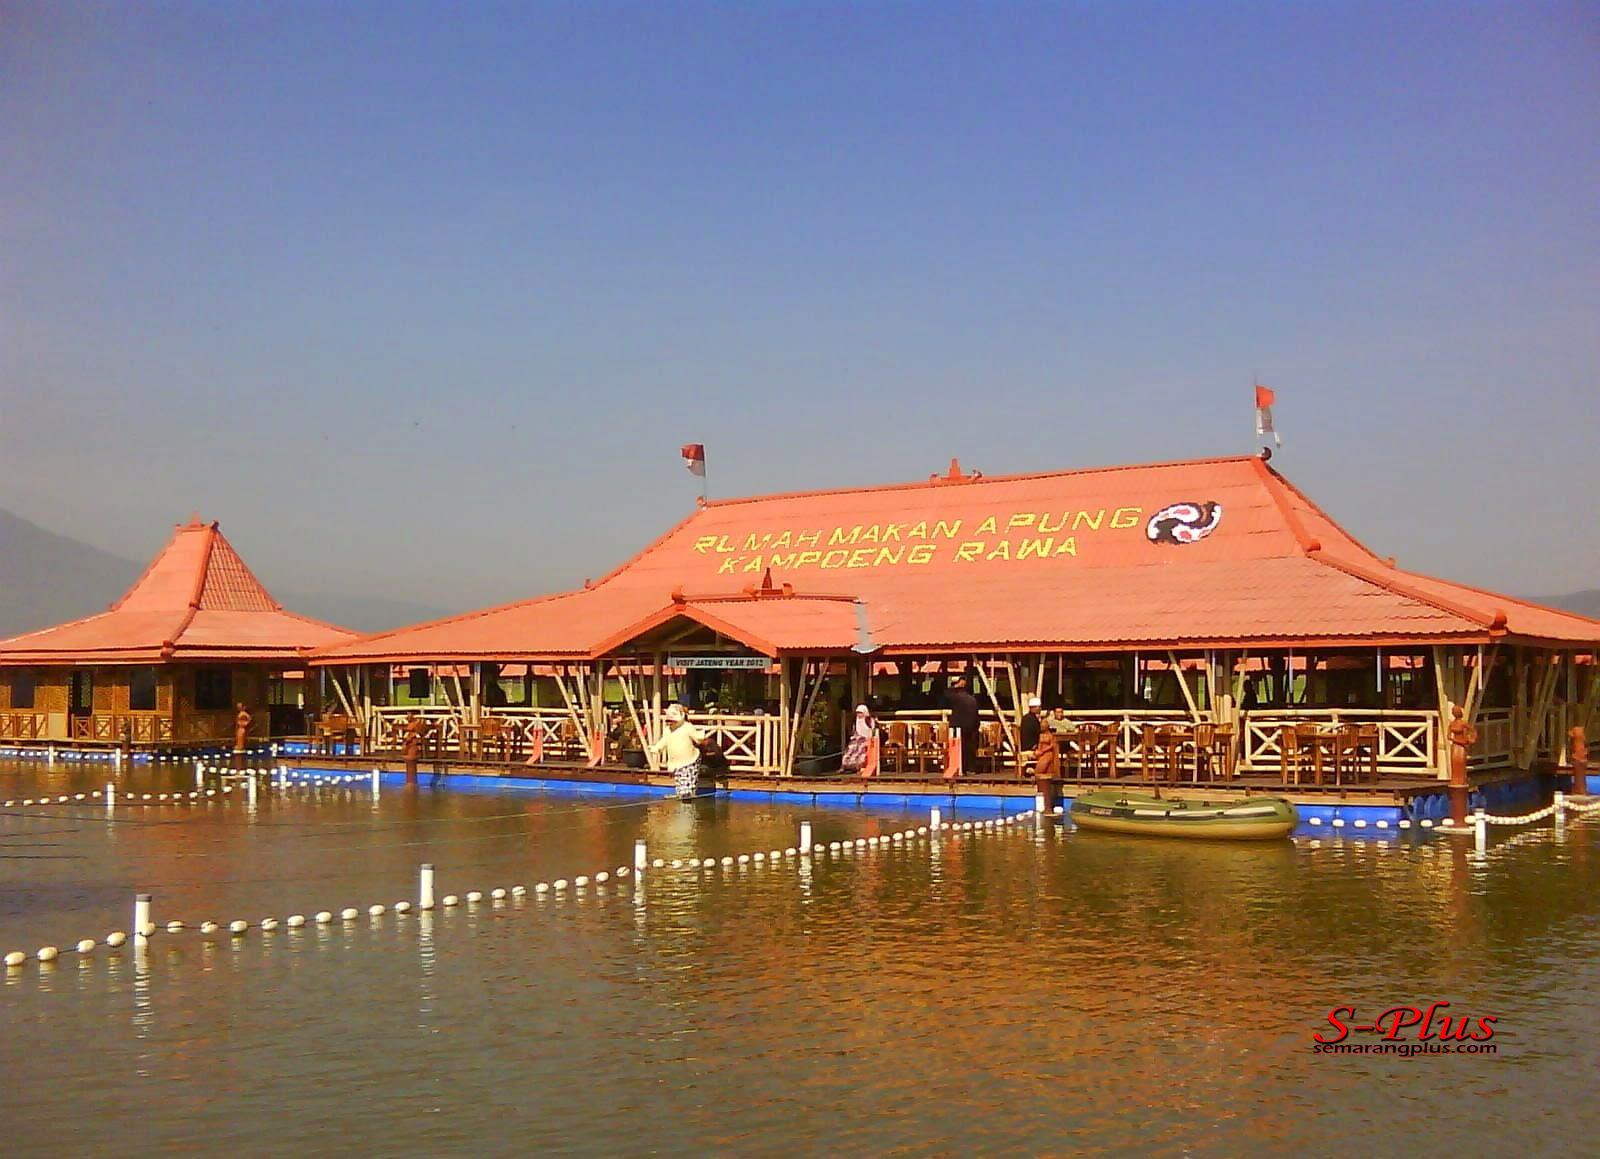 Wisata Apung Kampoeng Rawa Ambarawa Kabupaten Semarang Rumah Makan Jungle